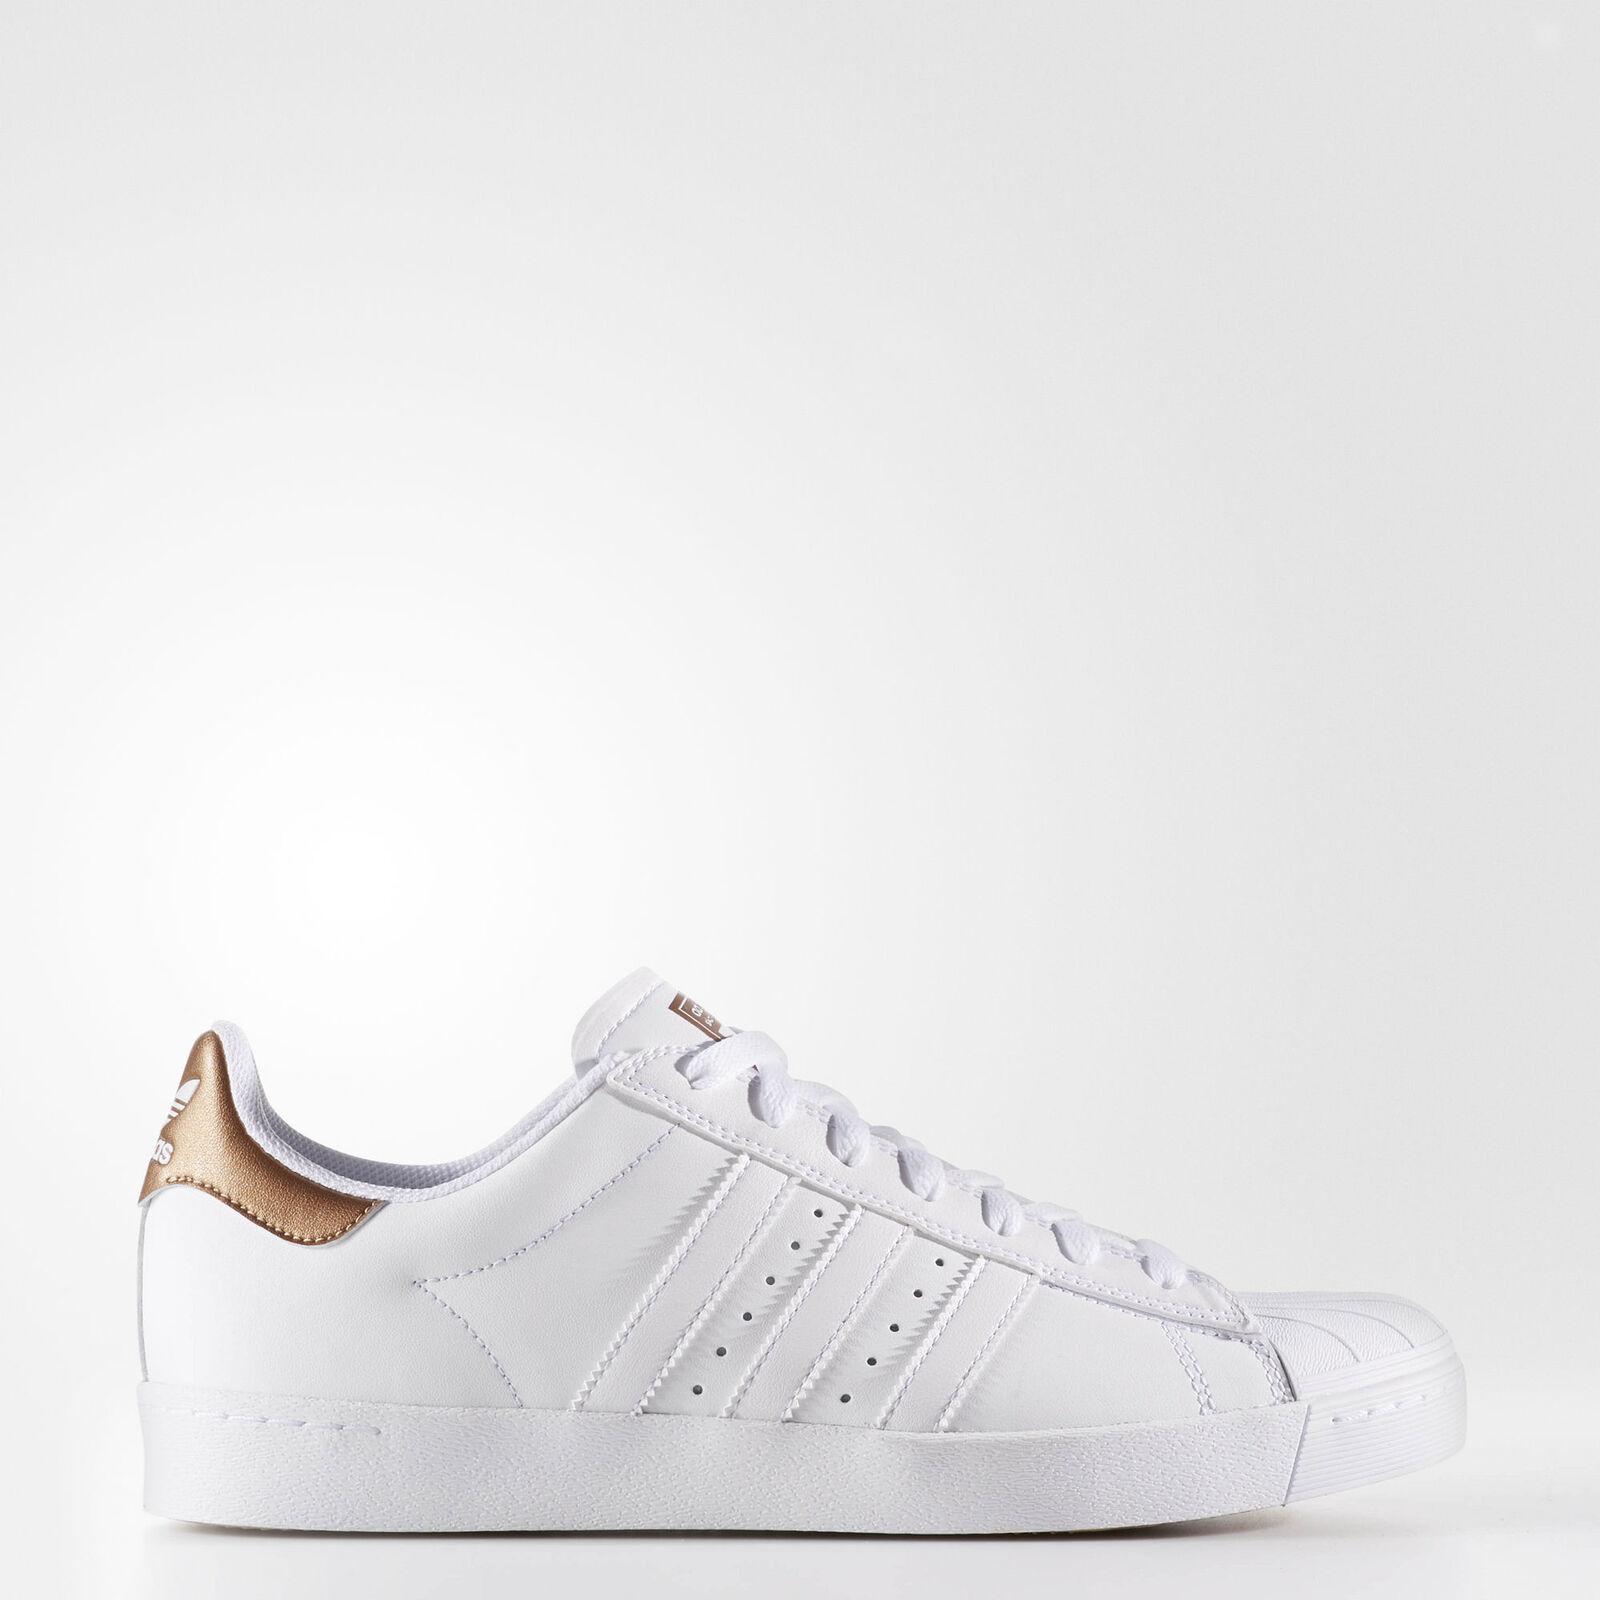 adidas v2 receipt adidas stan smith vulc black and white